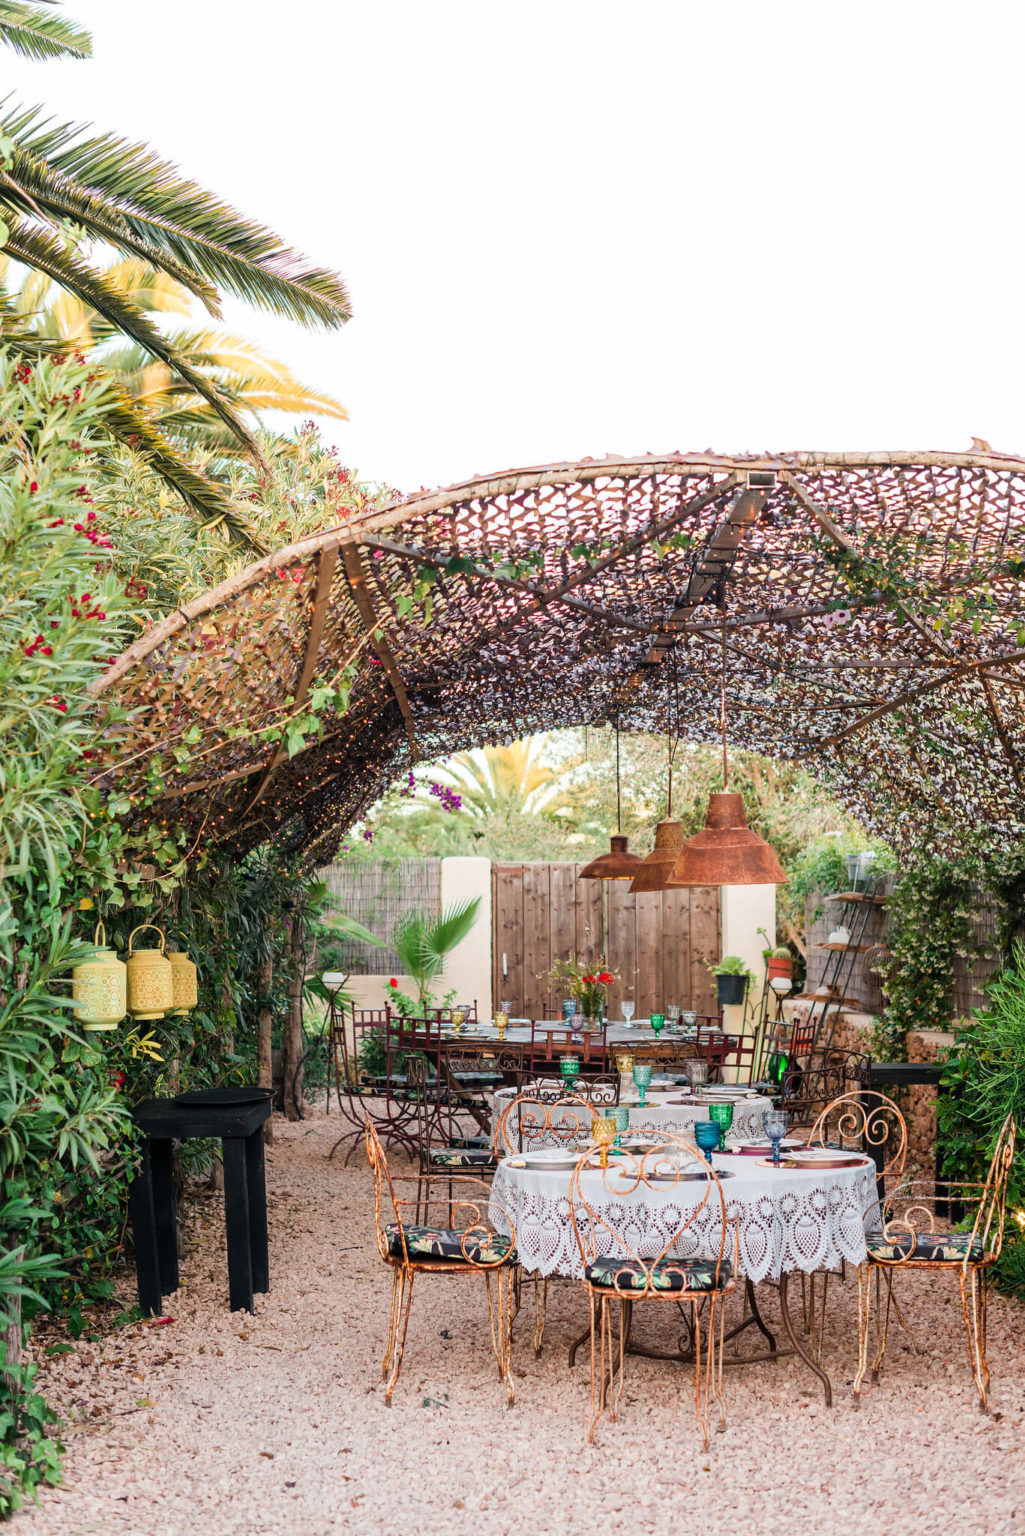 https://www.white-ibiza.com/wp-content/uploads/2020/03/formentera-restaurants-a-mi-manera-2020-06-1025x1536.jpg